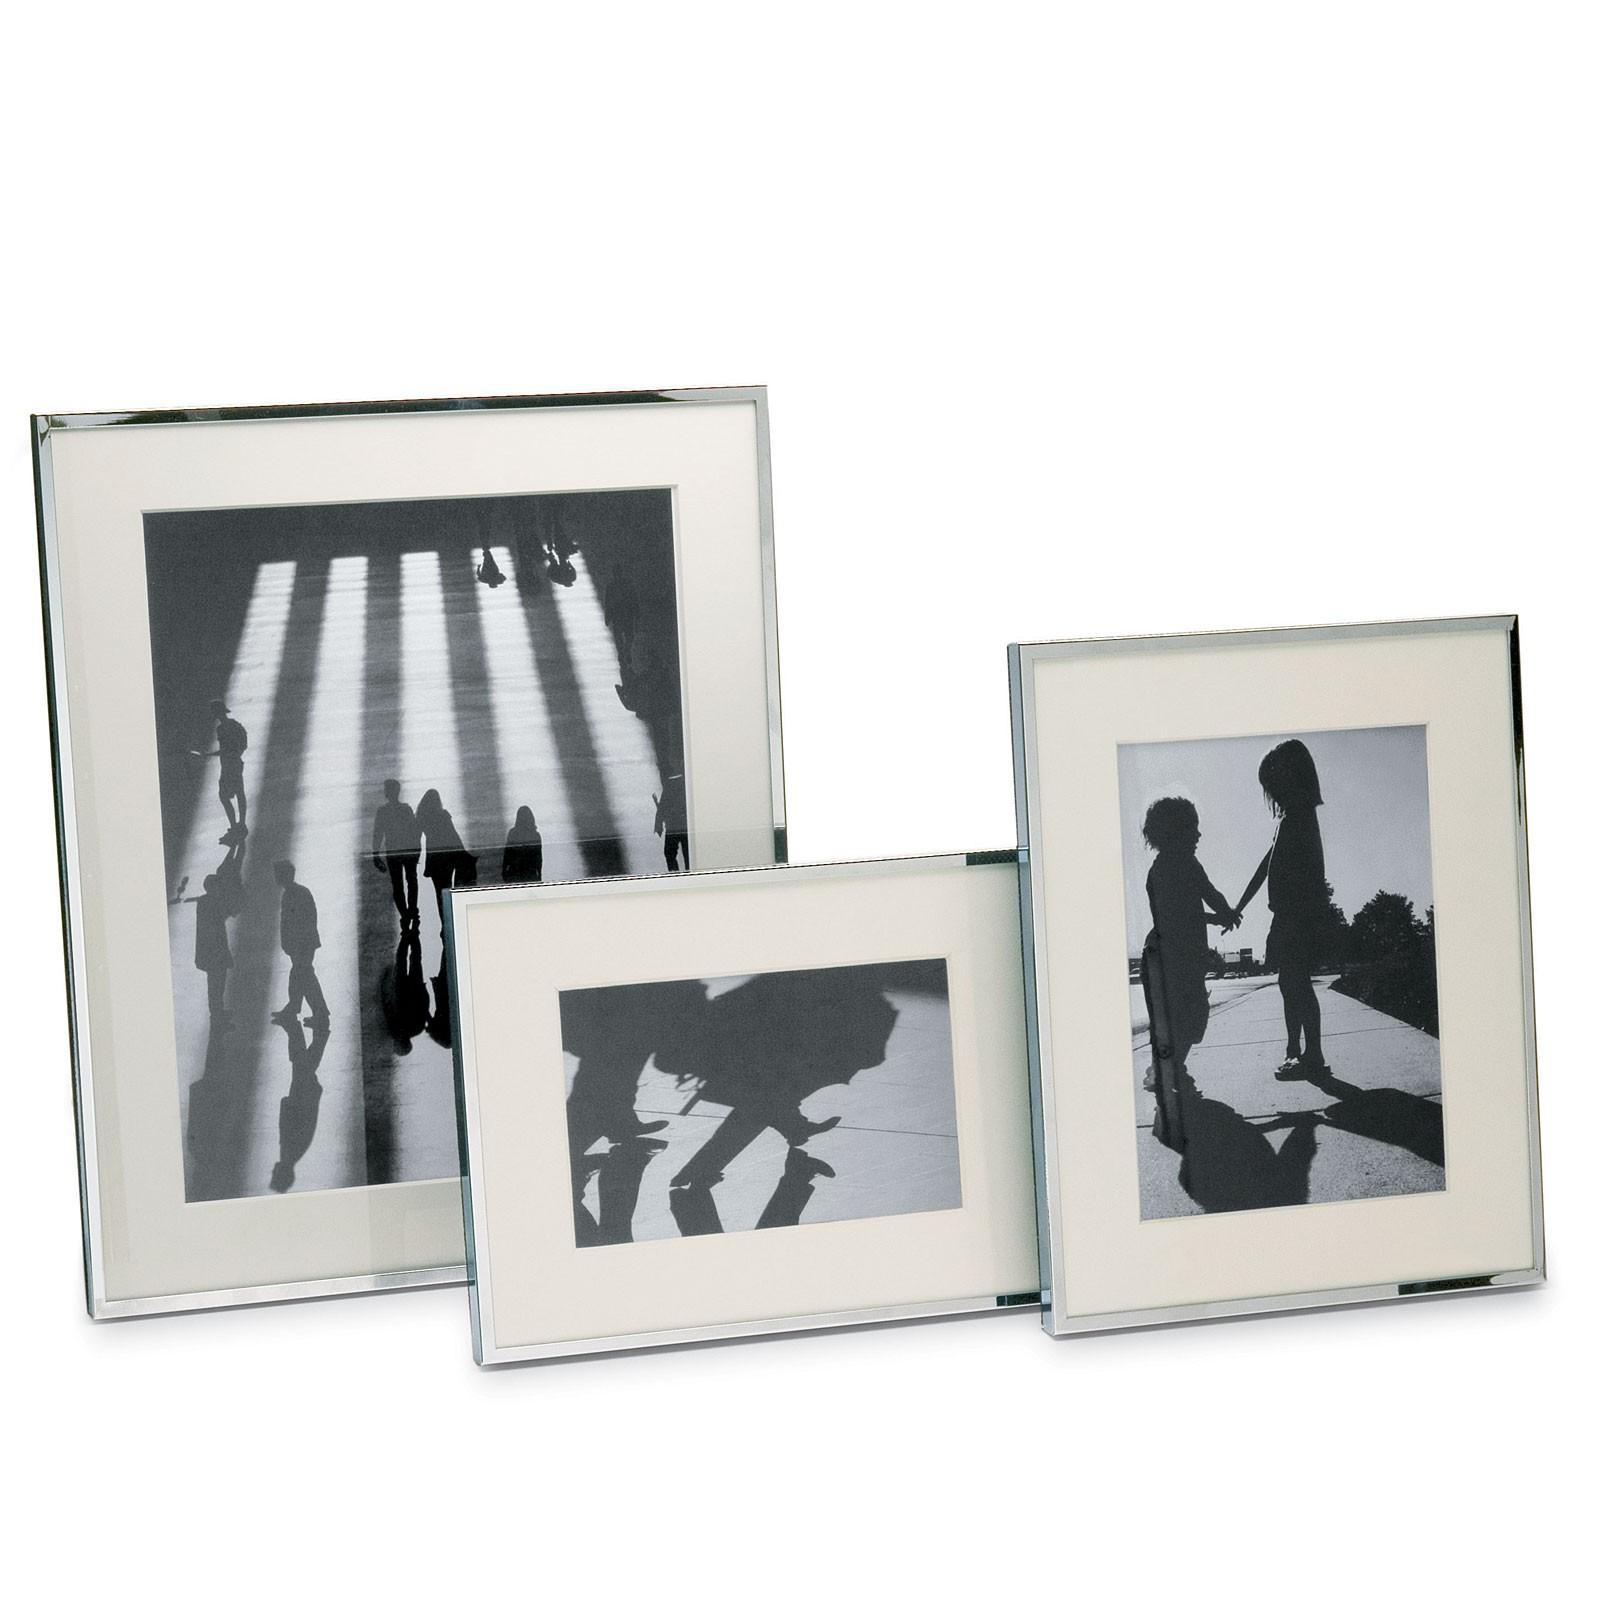 Bilderrahmen Chrom mit Passepartout 10 x 15 cm Philippi SHADOW